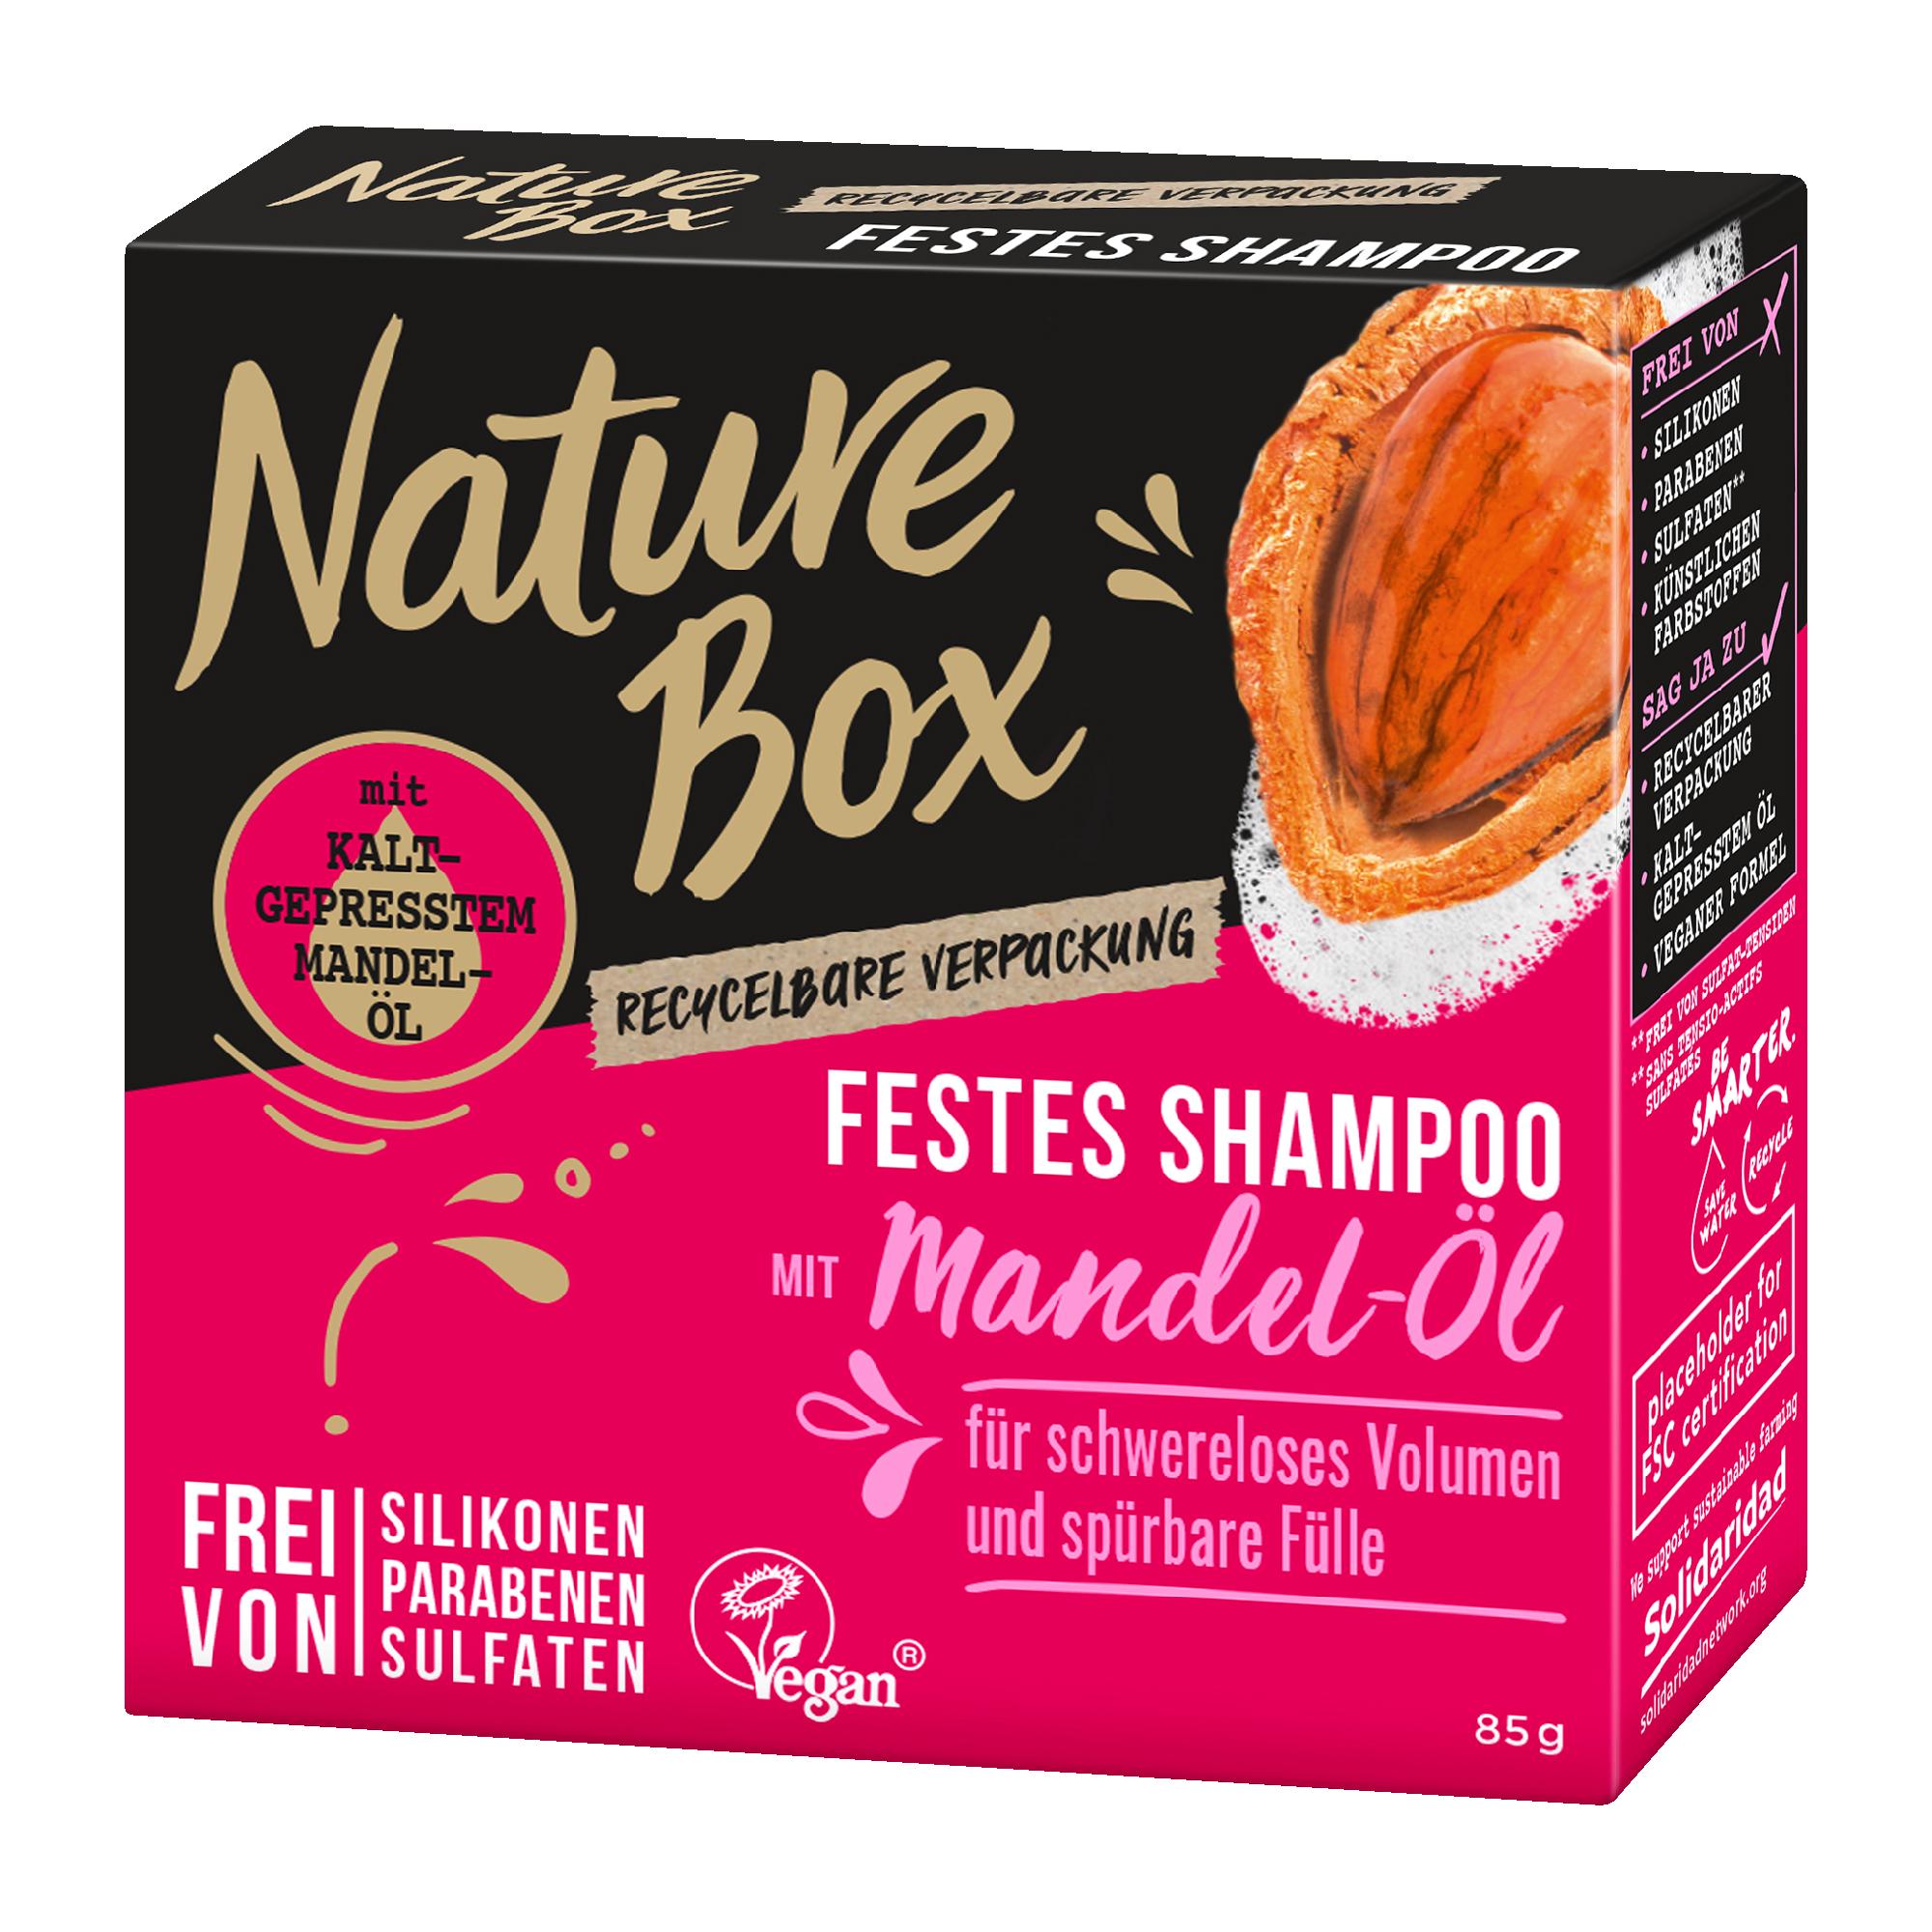 Nature Box Festes Shampoo Mandel